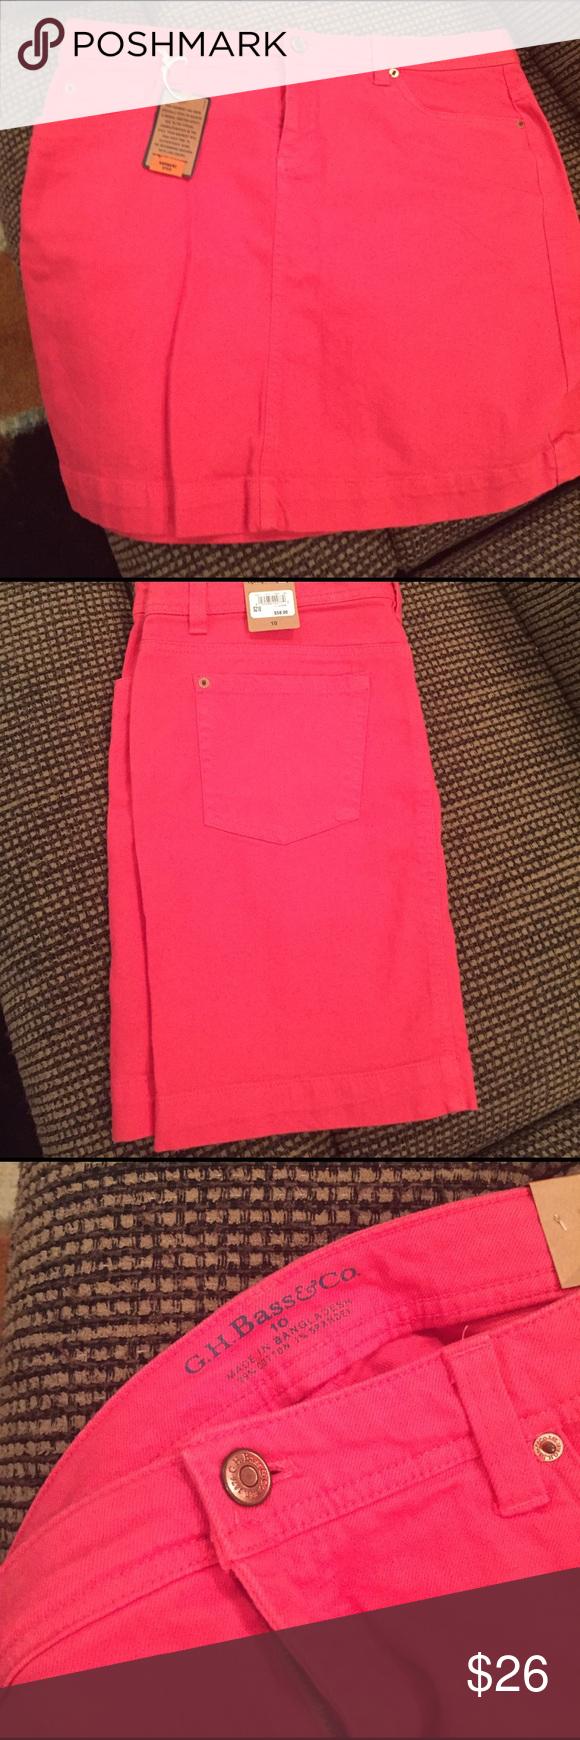 Bass Jean skirt Bass jean skirt in coral orange size 10. Brand new - never worn. Bass Skirts Mini